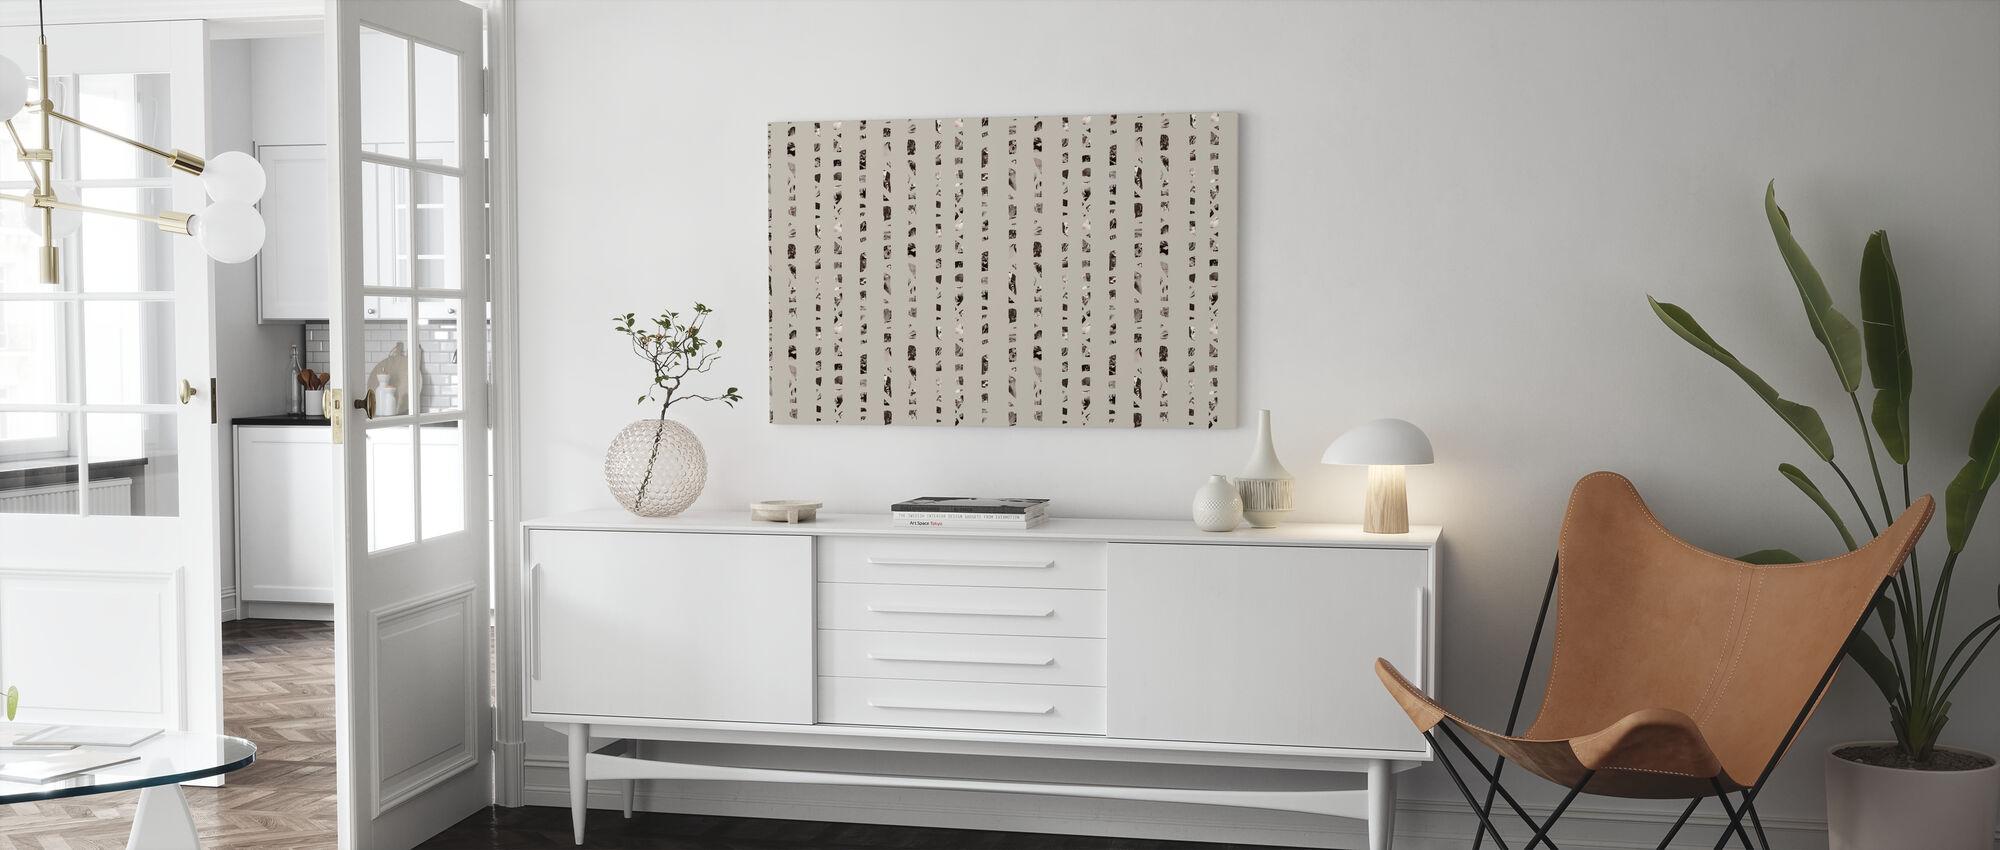 Studio Rita   Julia Heurling - Achter bomen - Licht - Canvas print - Woonkamer